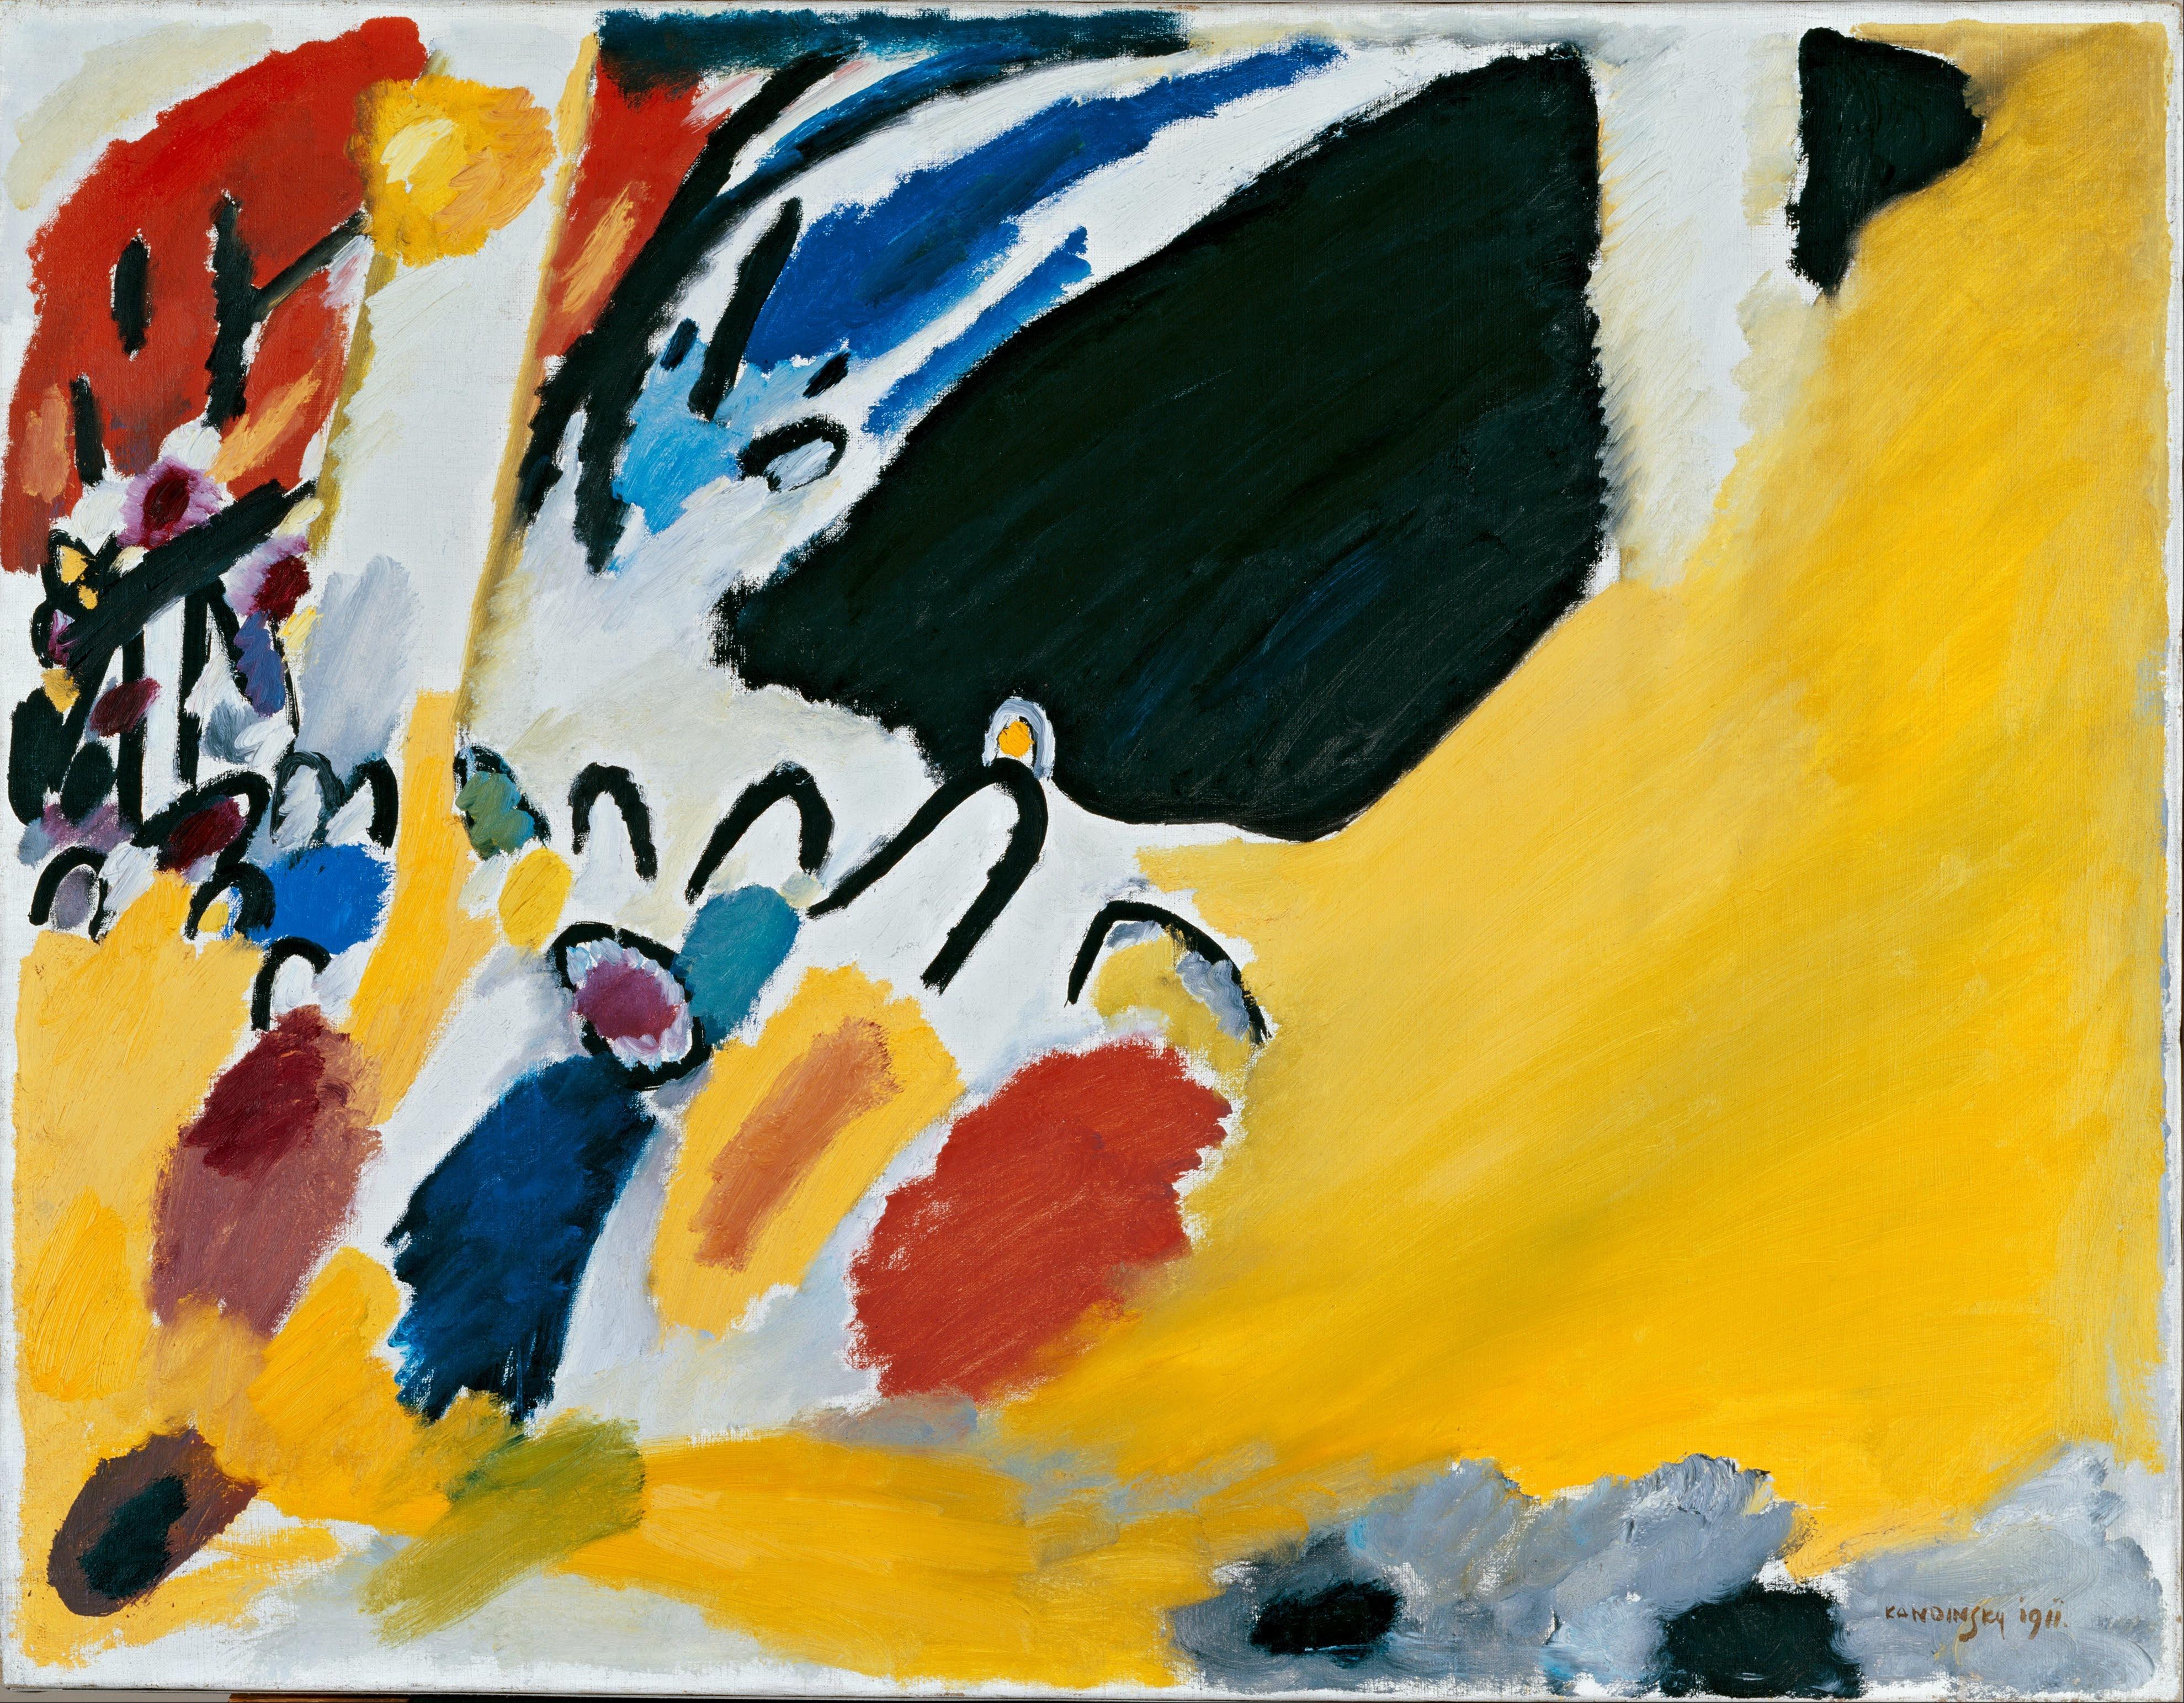 p8-9_conklin4_Wassily_Kandinsky_-_Impression_III_(Concert)_-_Google_Art_Project